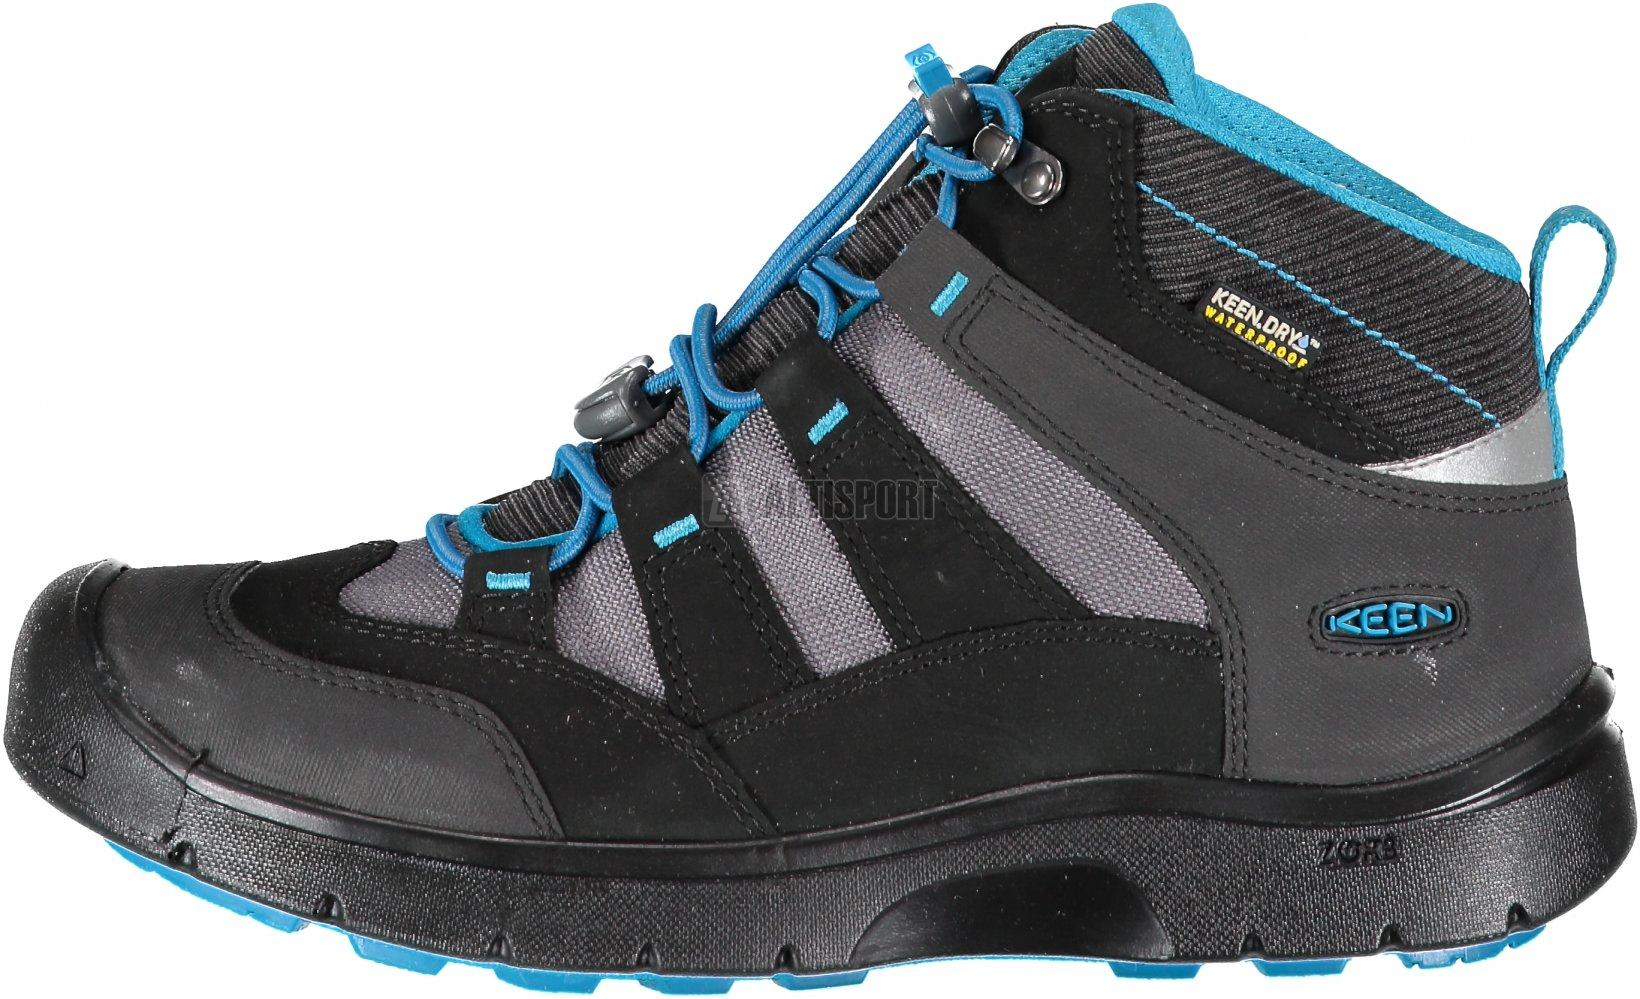 Dětské turistické boty KEEN HIKEPORT MID WP Y BLACK BLUE JEWEL ... 67261cc9aa